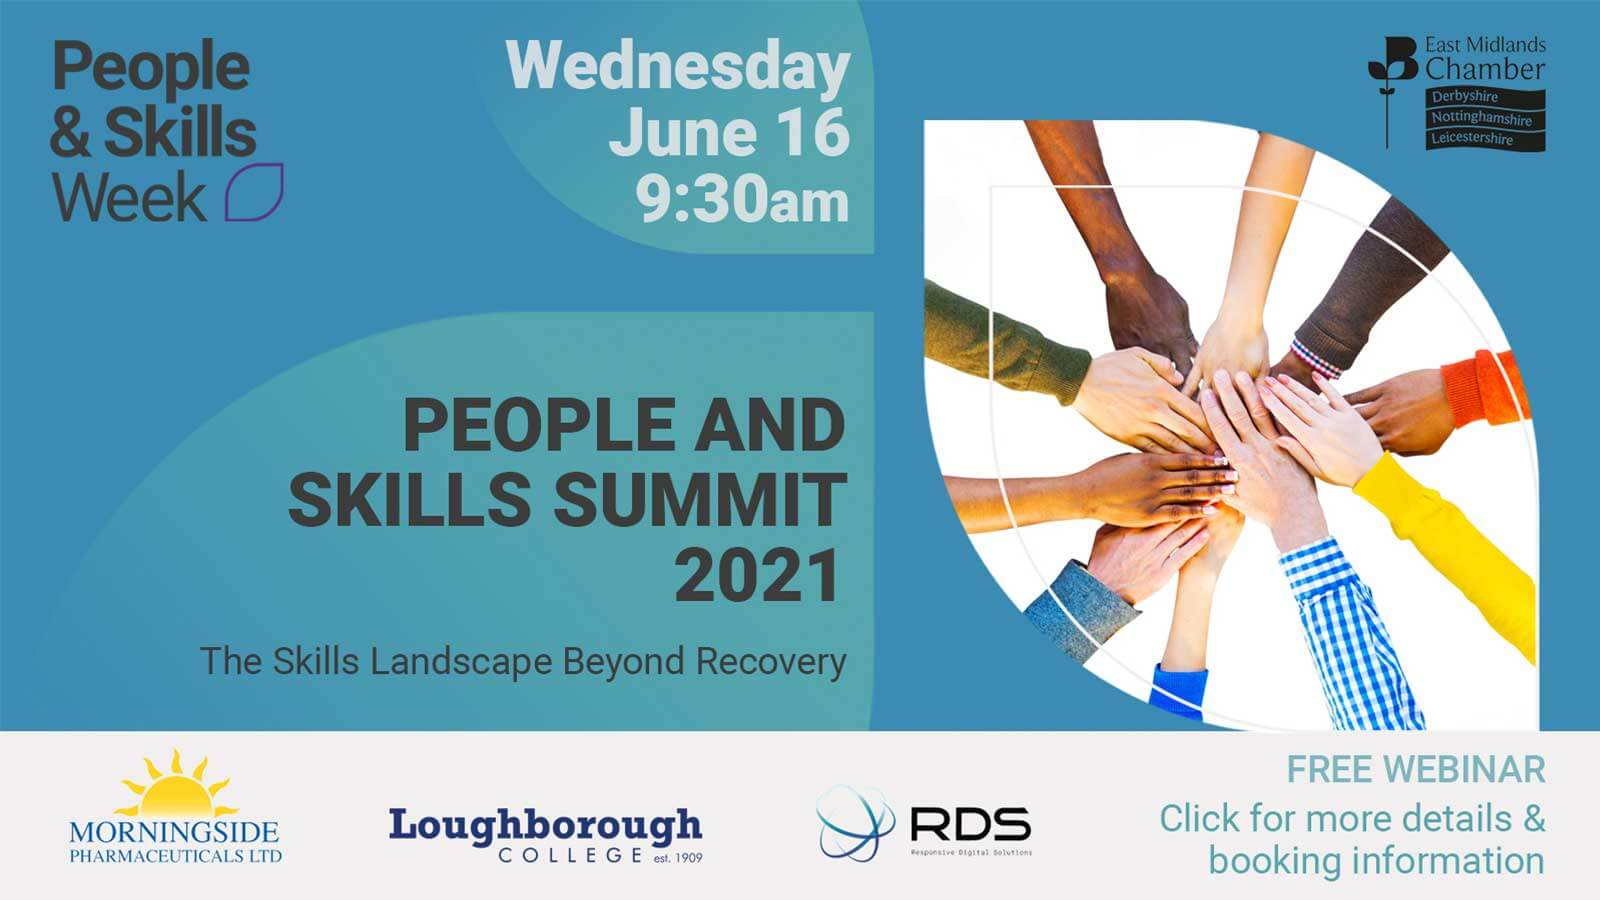 East Midlands Chamber of Commerce's People & Skills Summit 2021